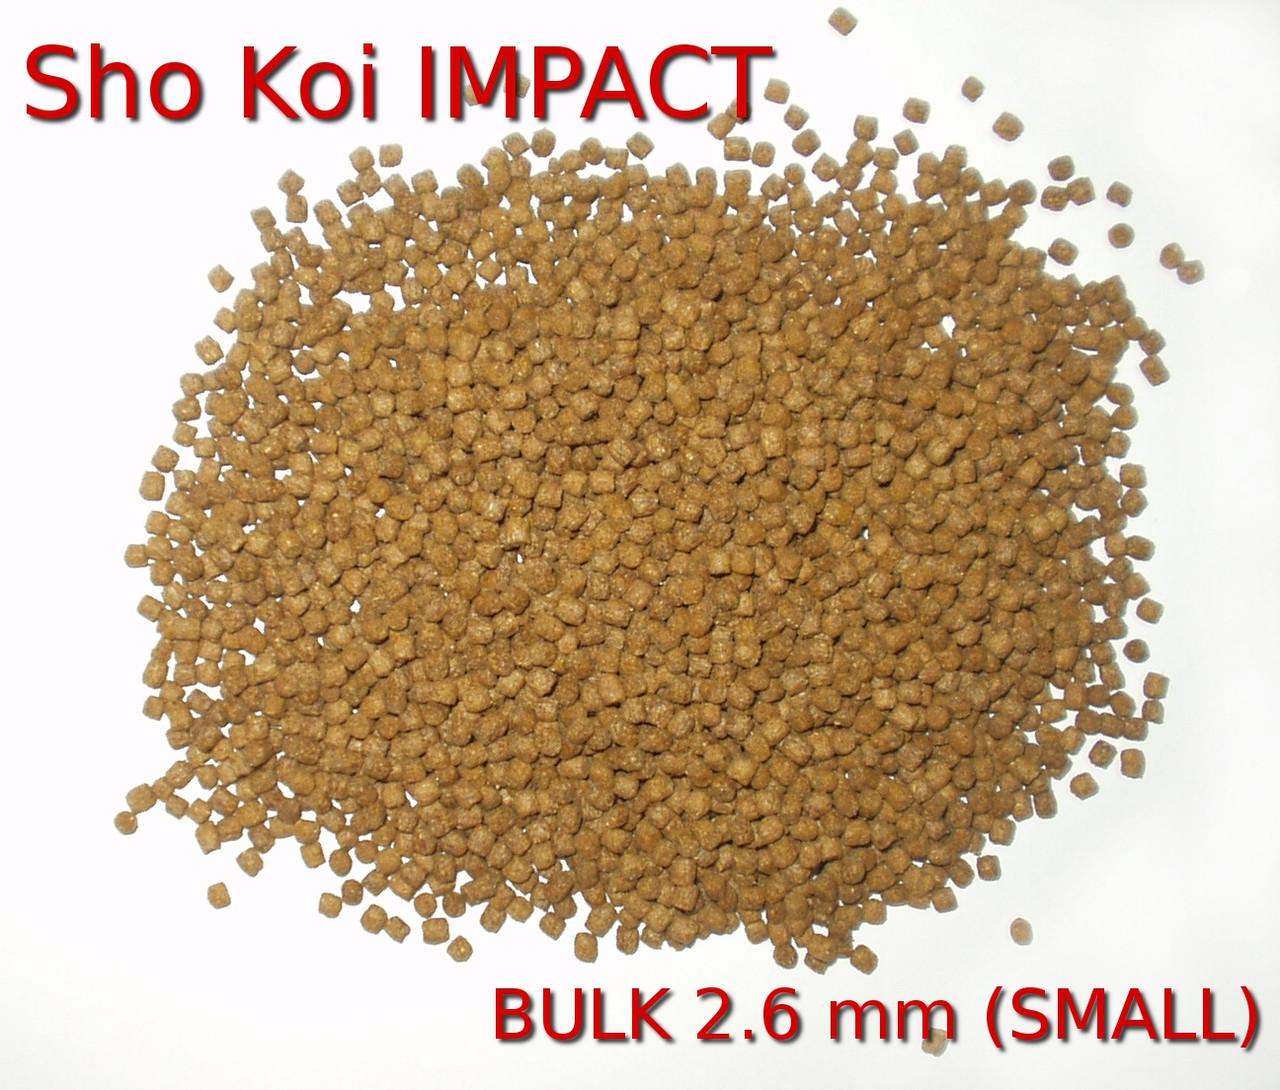 Sho Koi bulk small 2 6 mm- 5 LB